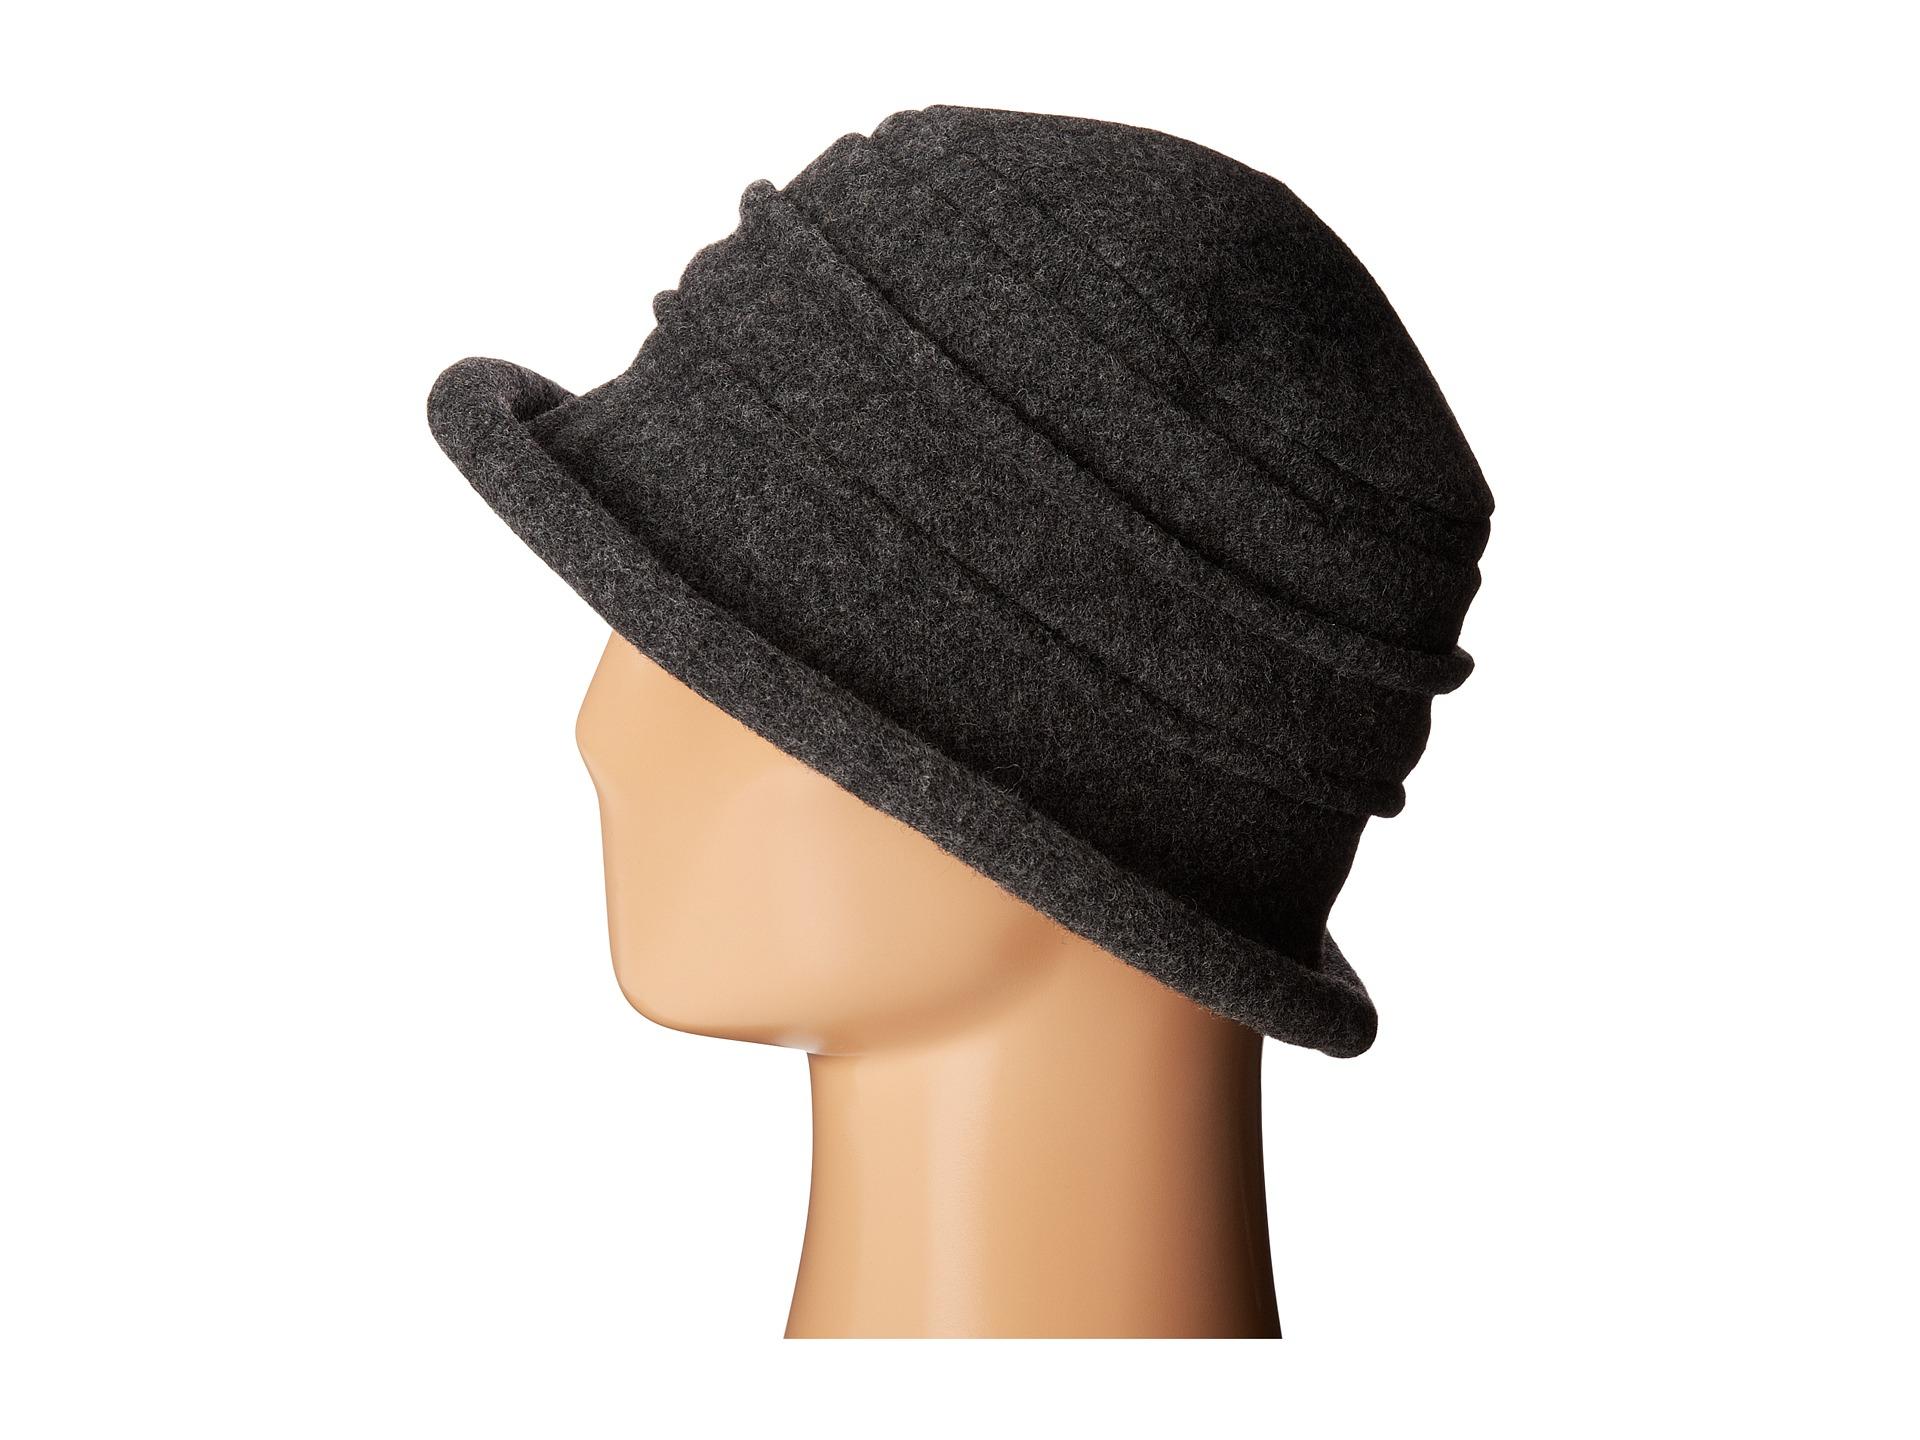 e7c9aa489ab Lyst - Scala Packable Wool Felt Cloche in Gray